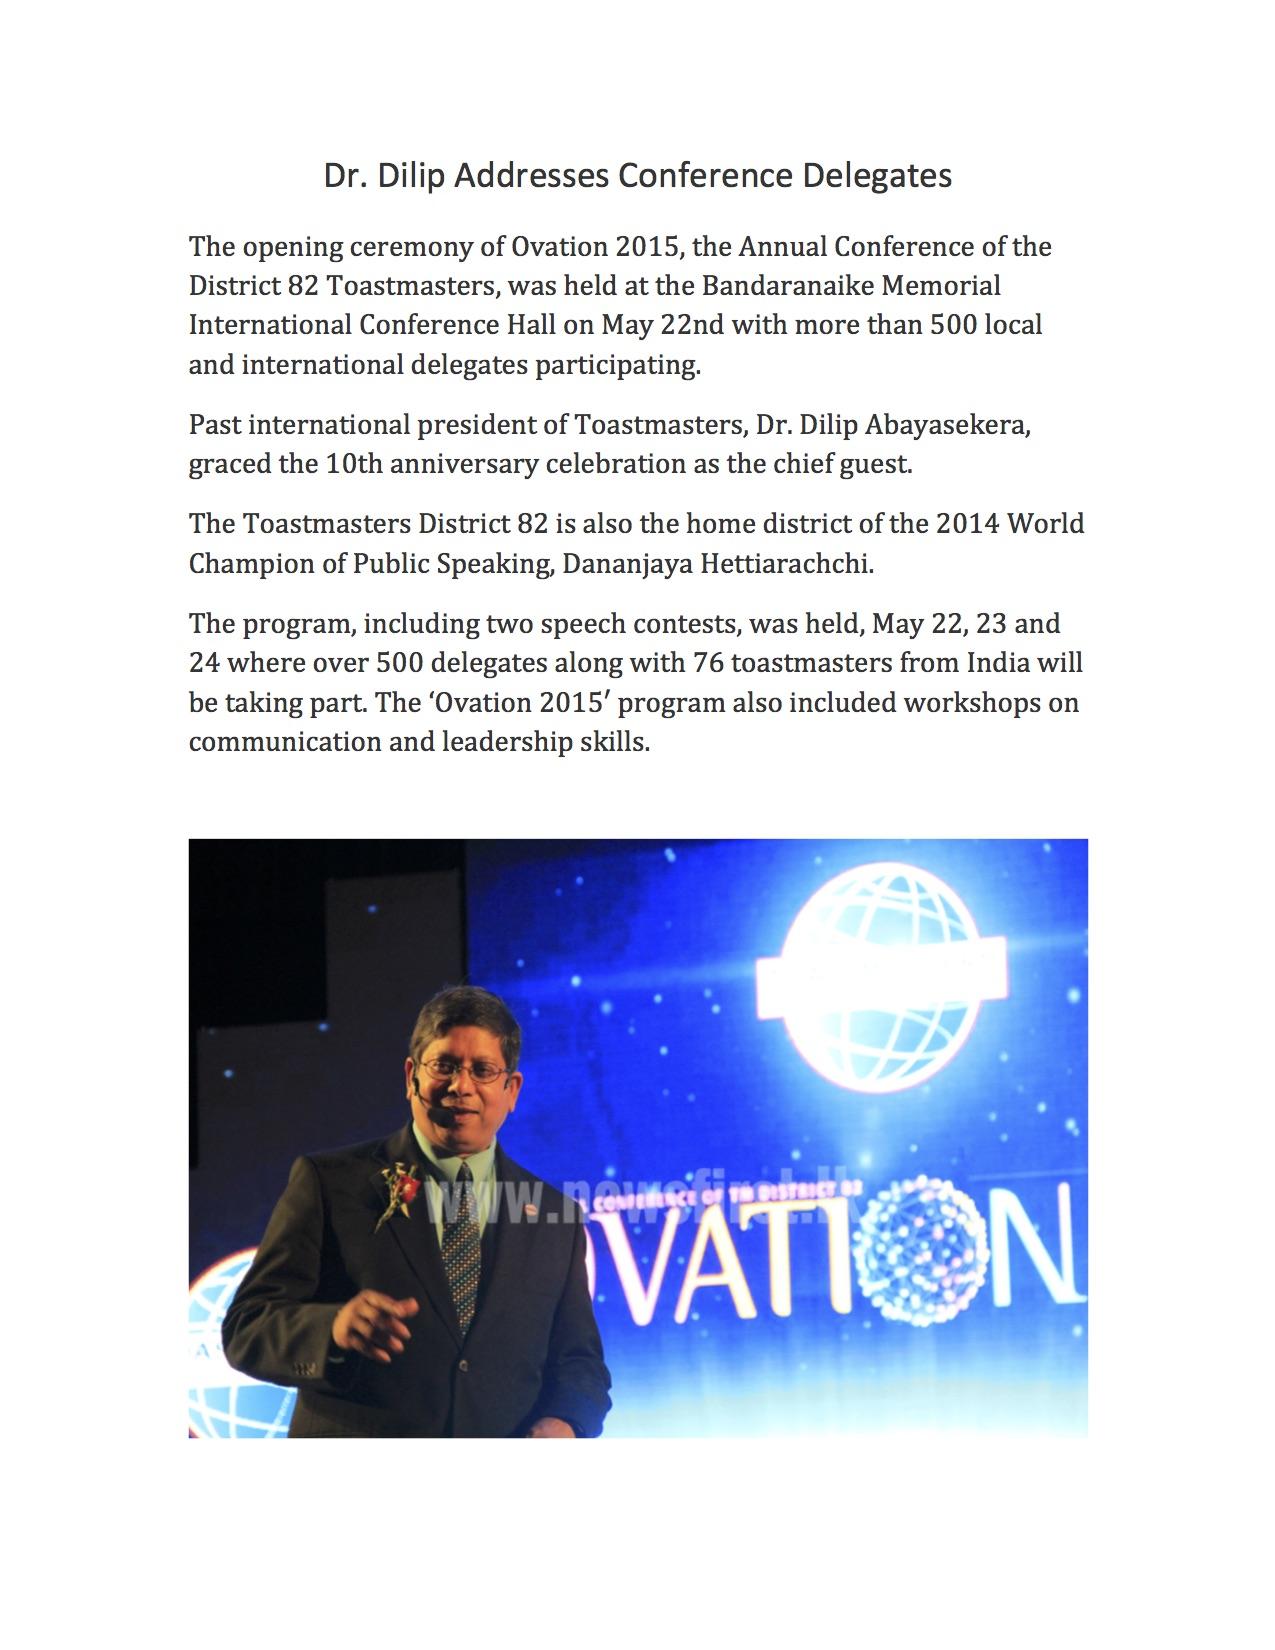 Keynote Address, Toastmasters Conference, May 22, 2015, Sri Lanka